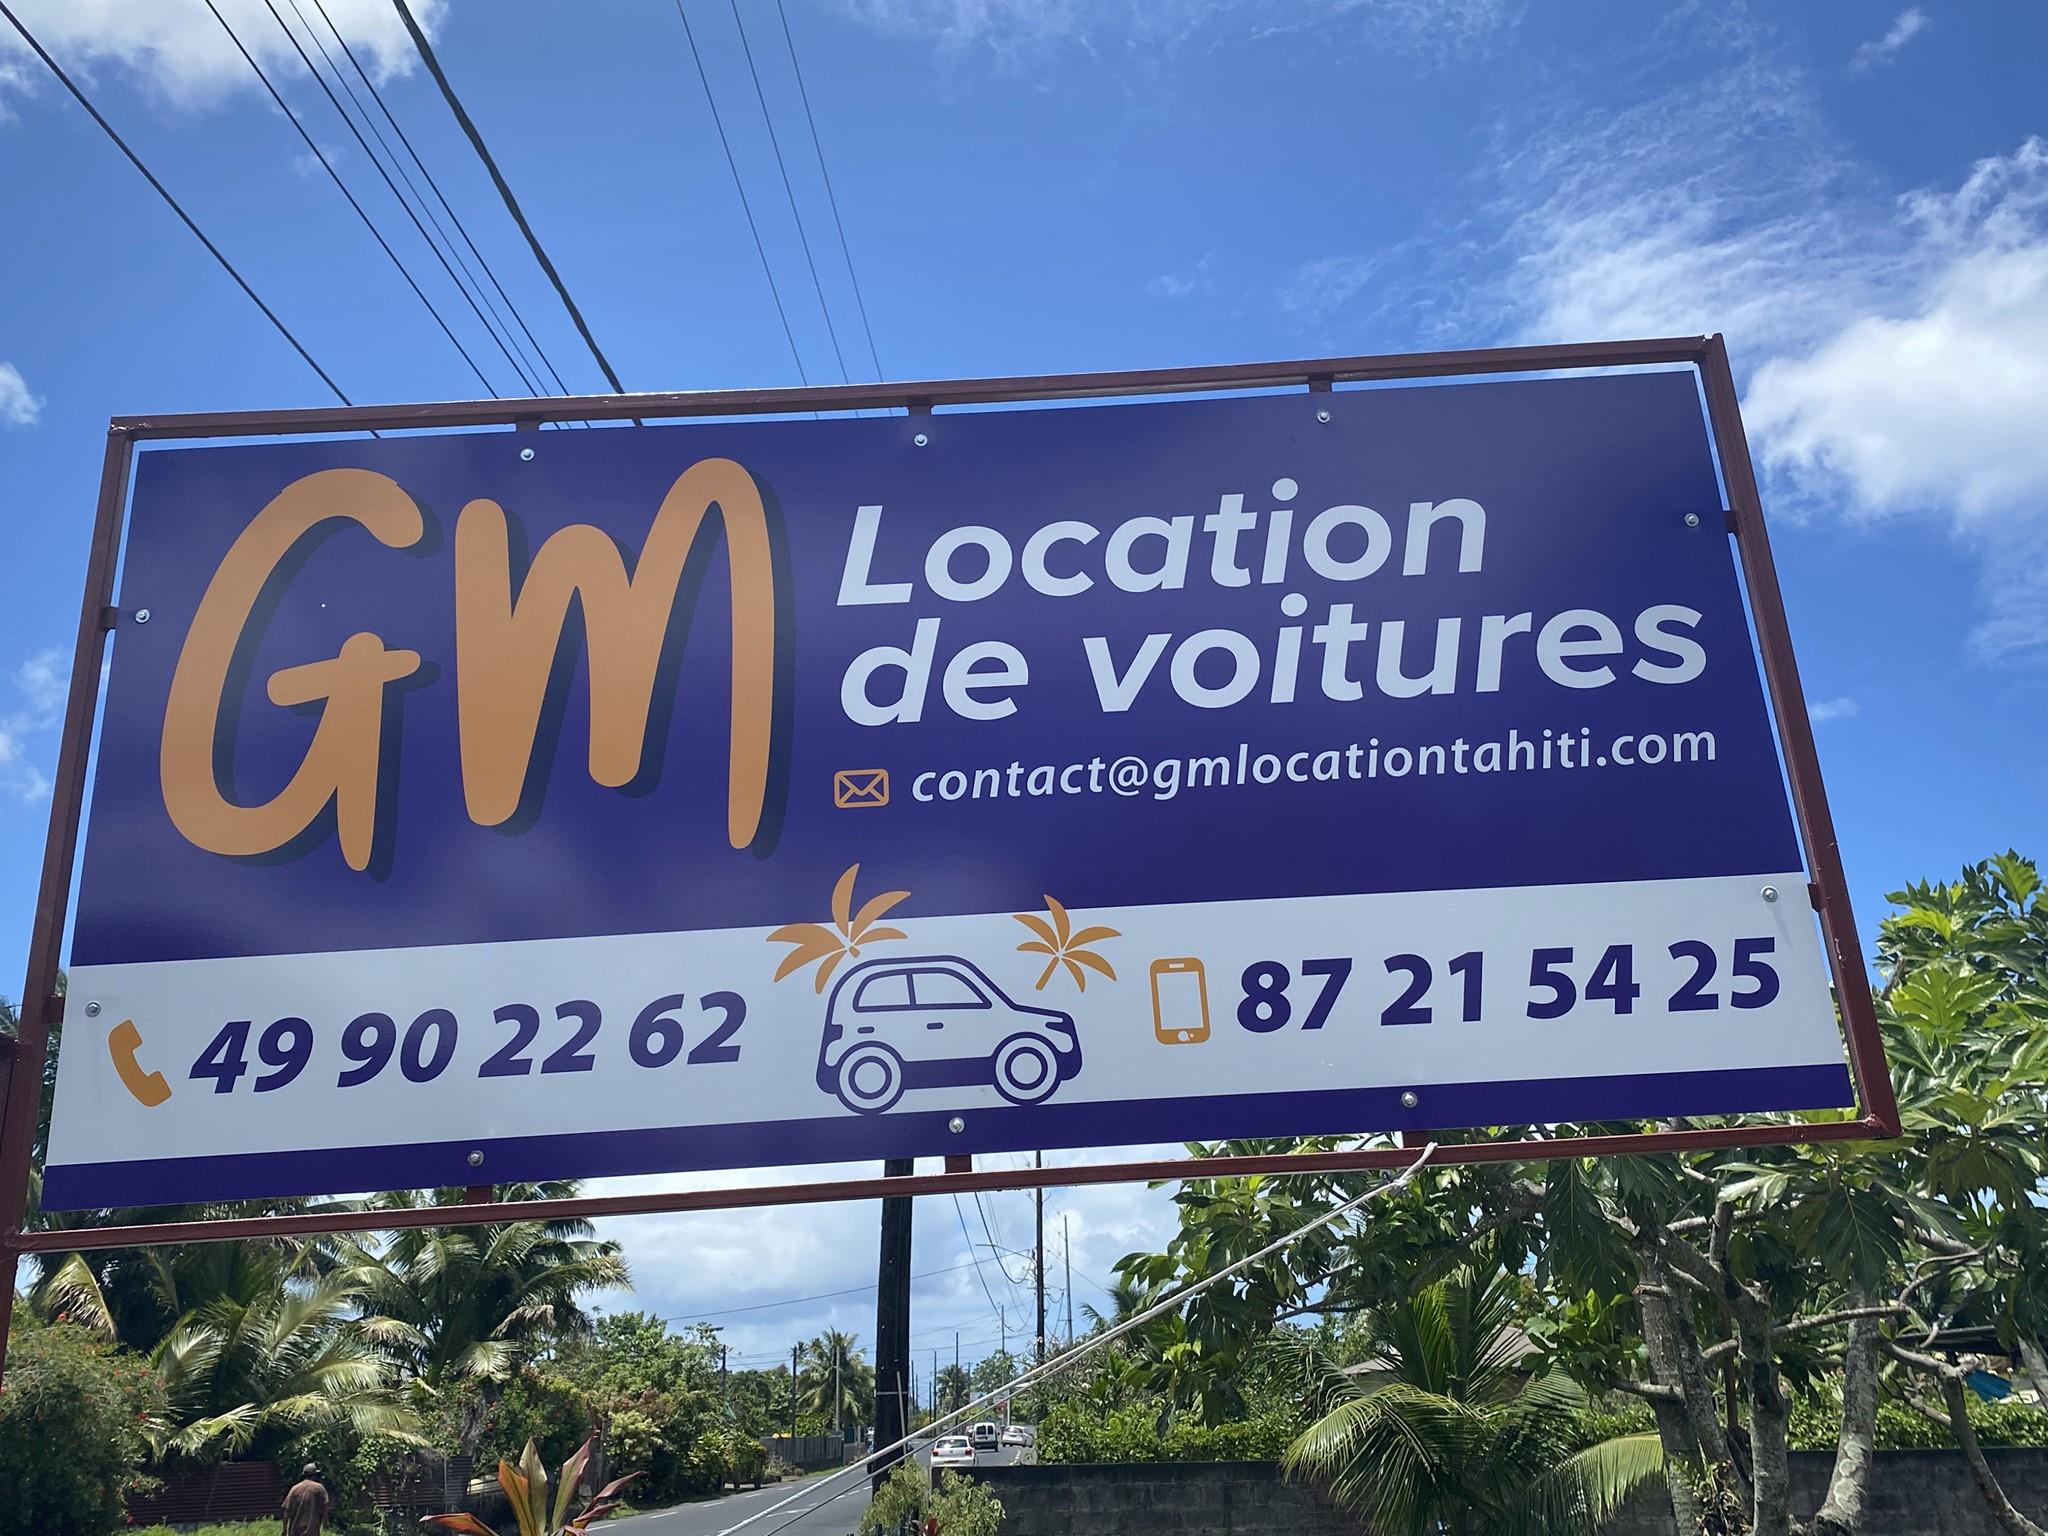 https://tahititourisme.com/wp-content/uploads/2020/03/gmlocationphotodecouverture.jpg